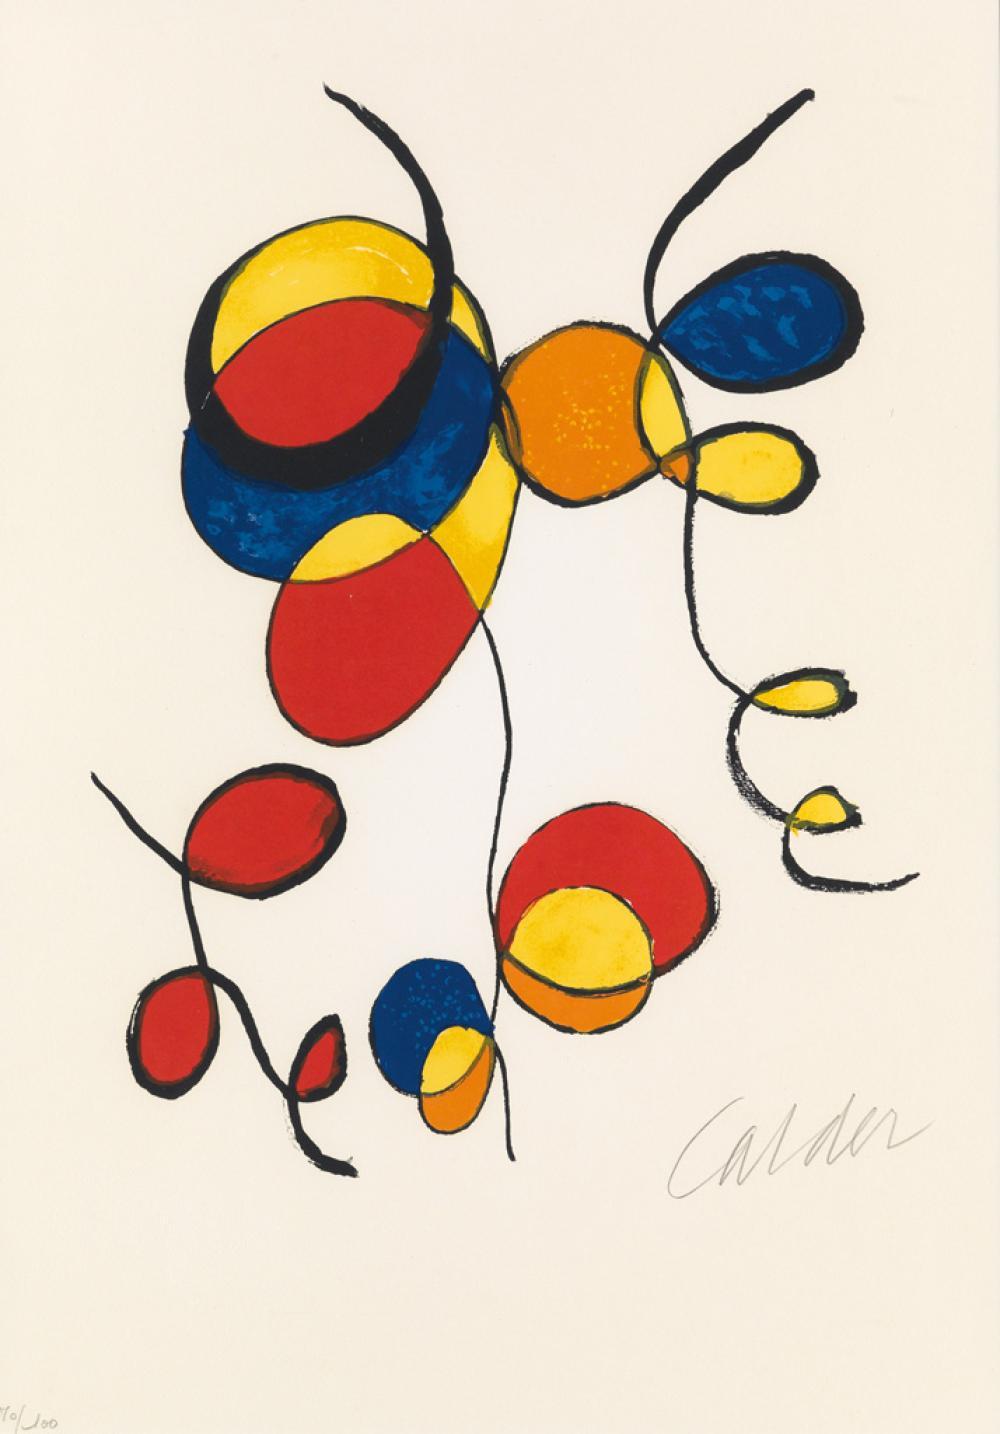 ALEXANDER CALDER Ballons et Cerfs Volants.